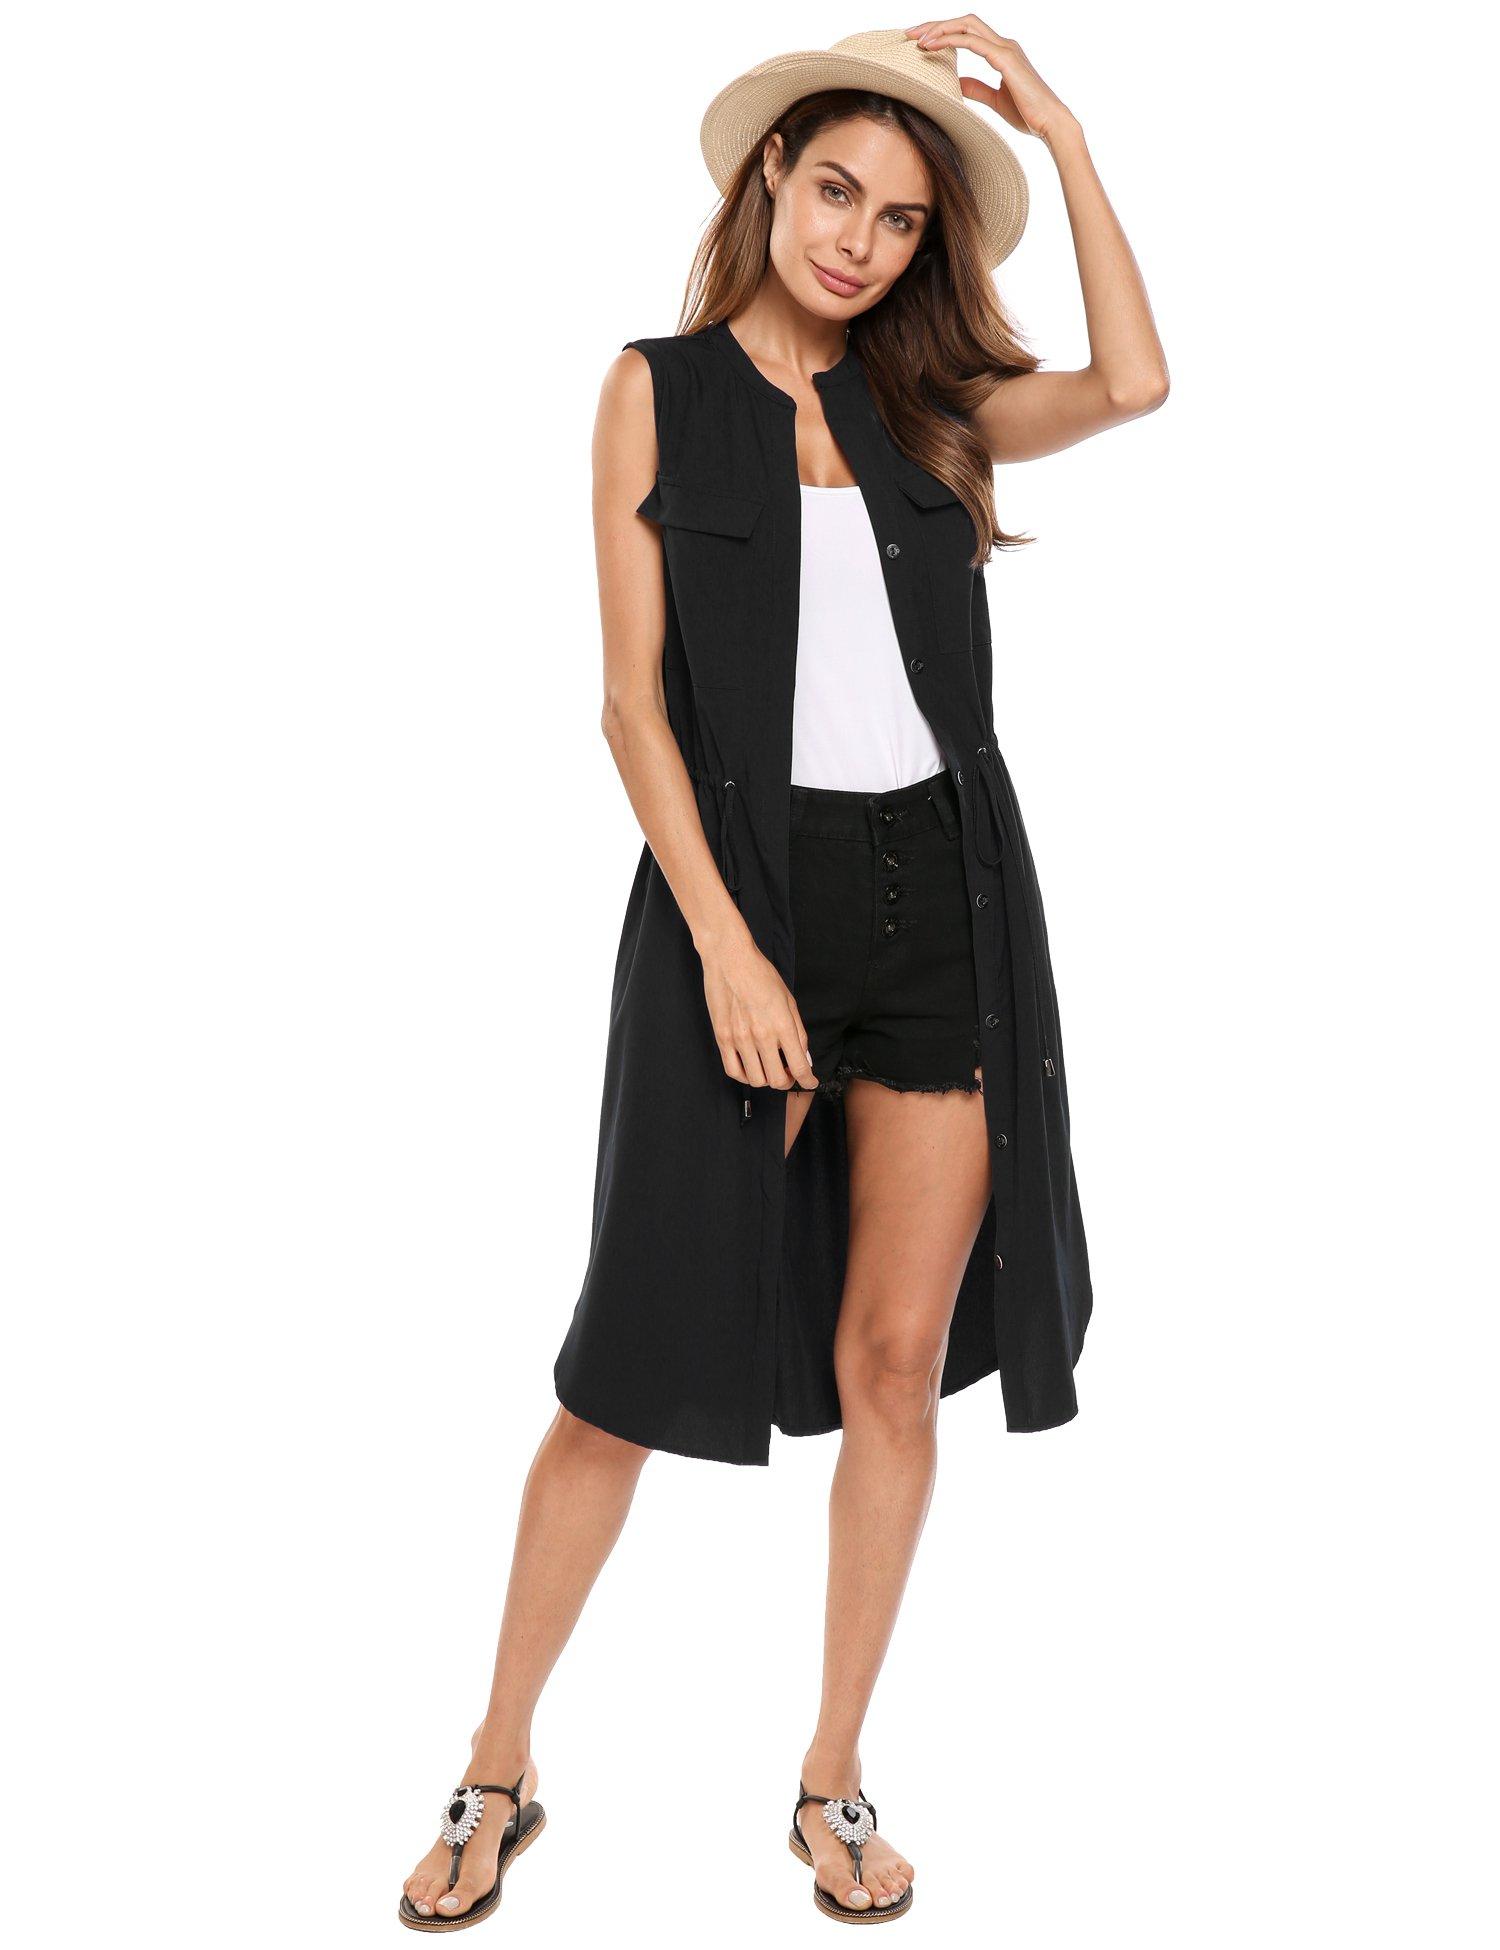 Beyove Women's British Style Lapel Collar Long Windbreaker Parka Sleeveless Trench Vest Cardigan Black L